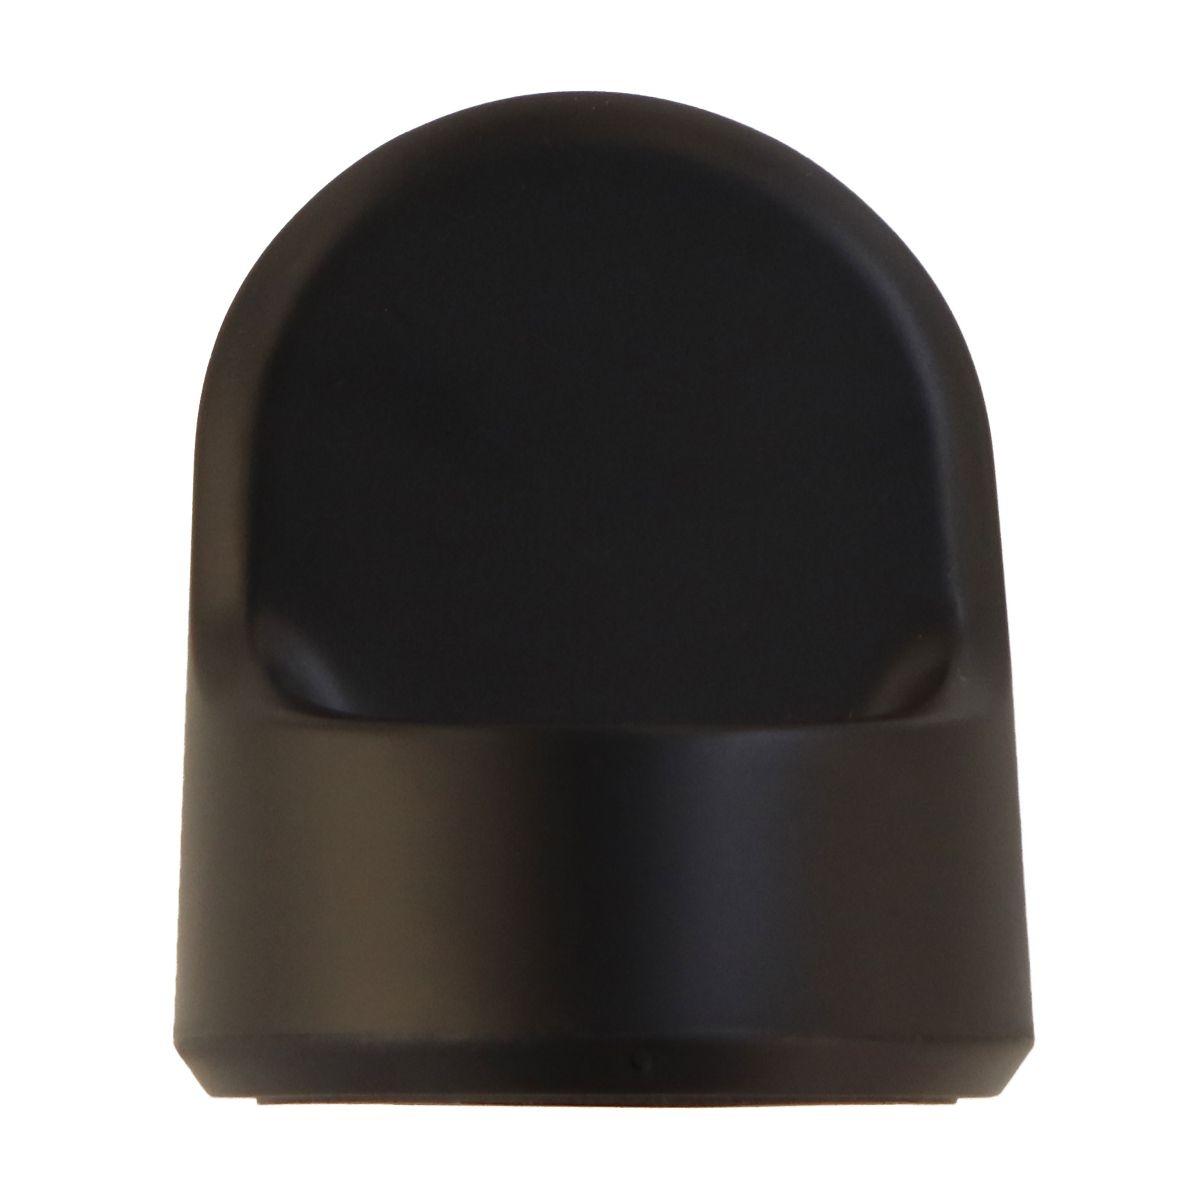 Renewed-Generic-Charging-Dock-Wireless-Charger-for-Moto-360-Smartwatches miniatuur 3